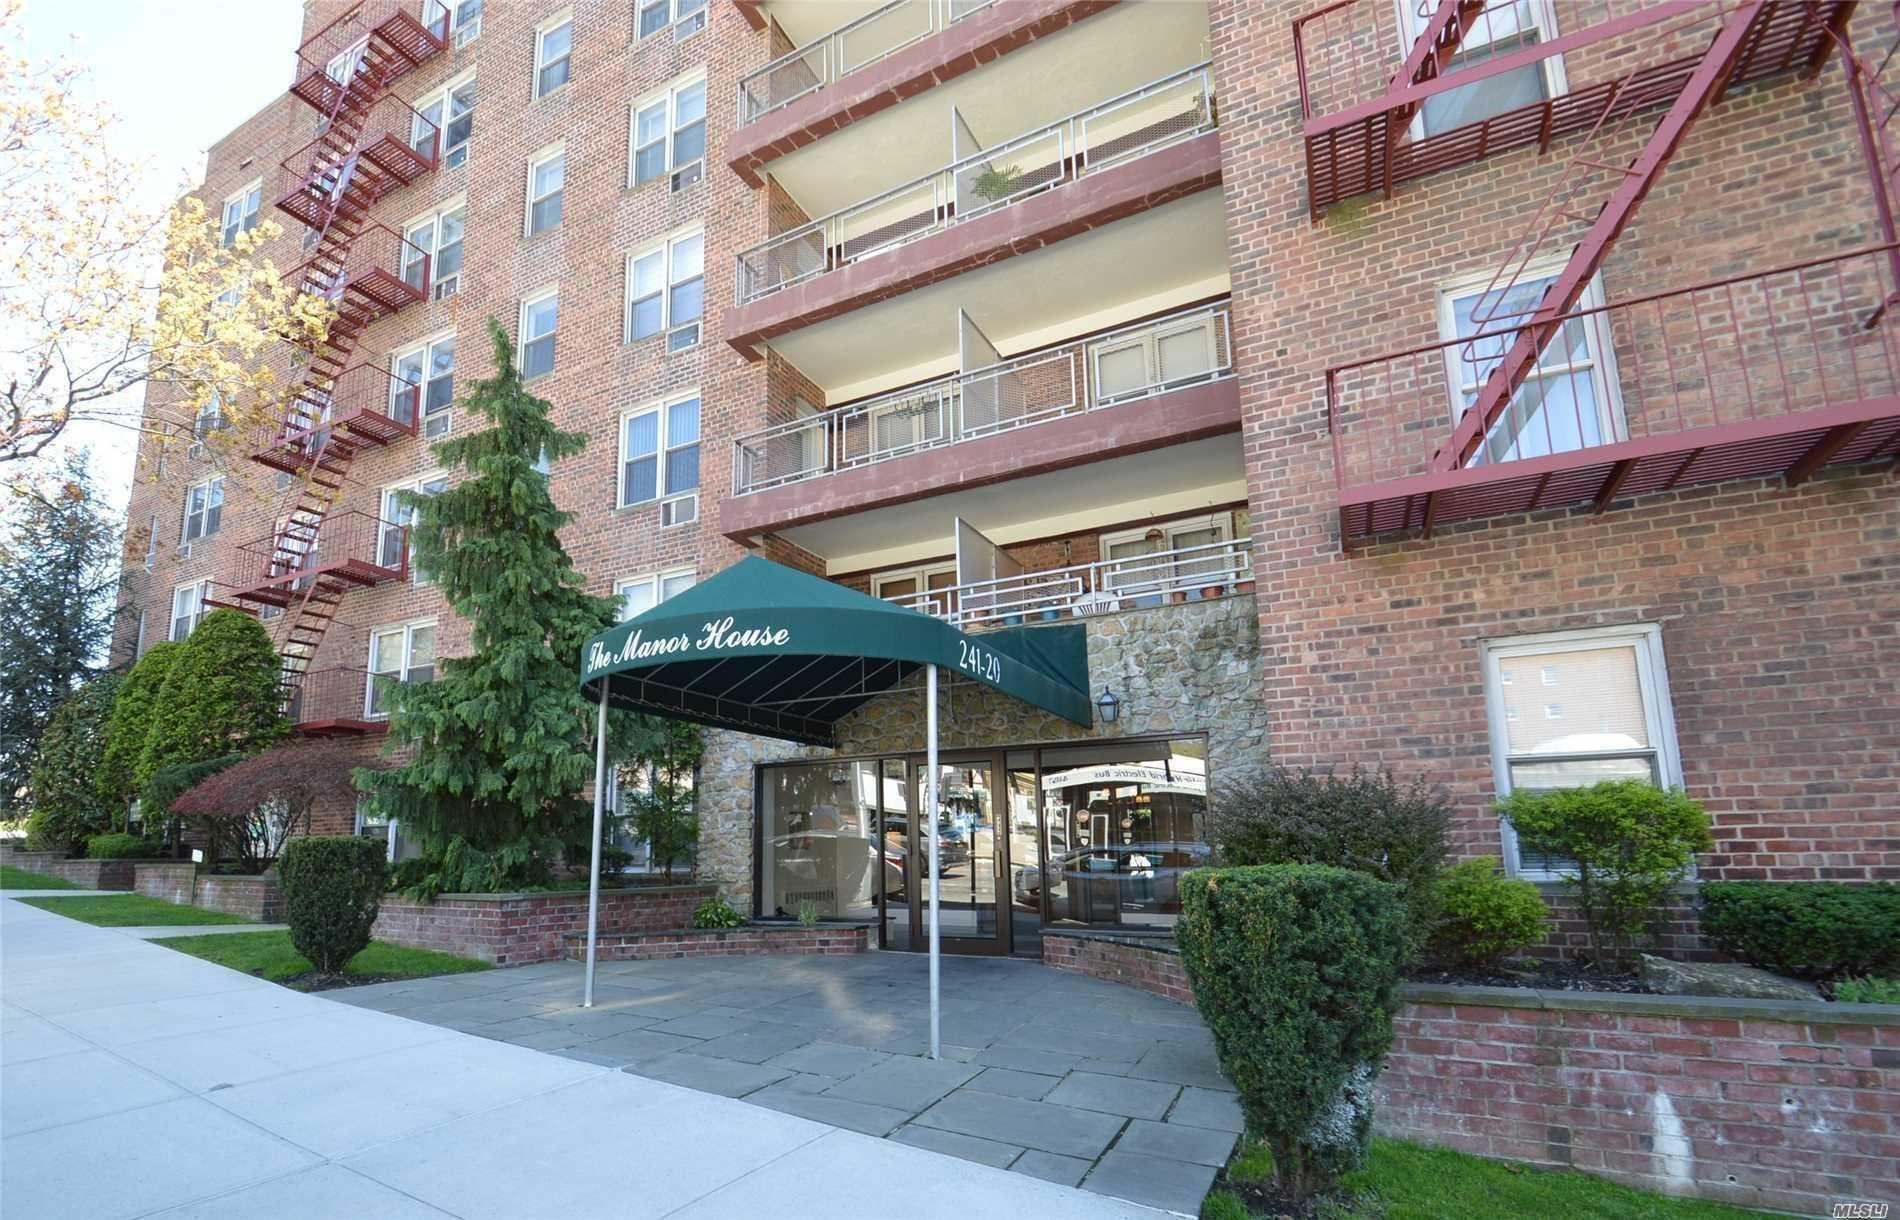 241-20 Northern Boulevard #5P, Douglaston, NY 11362 - MLS#: 3188970